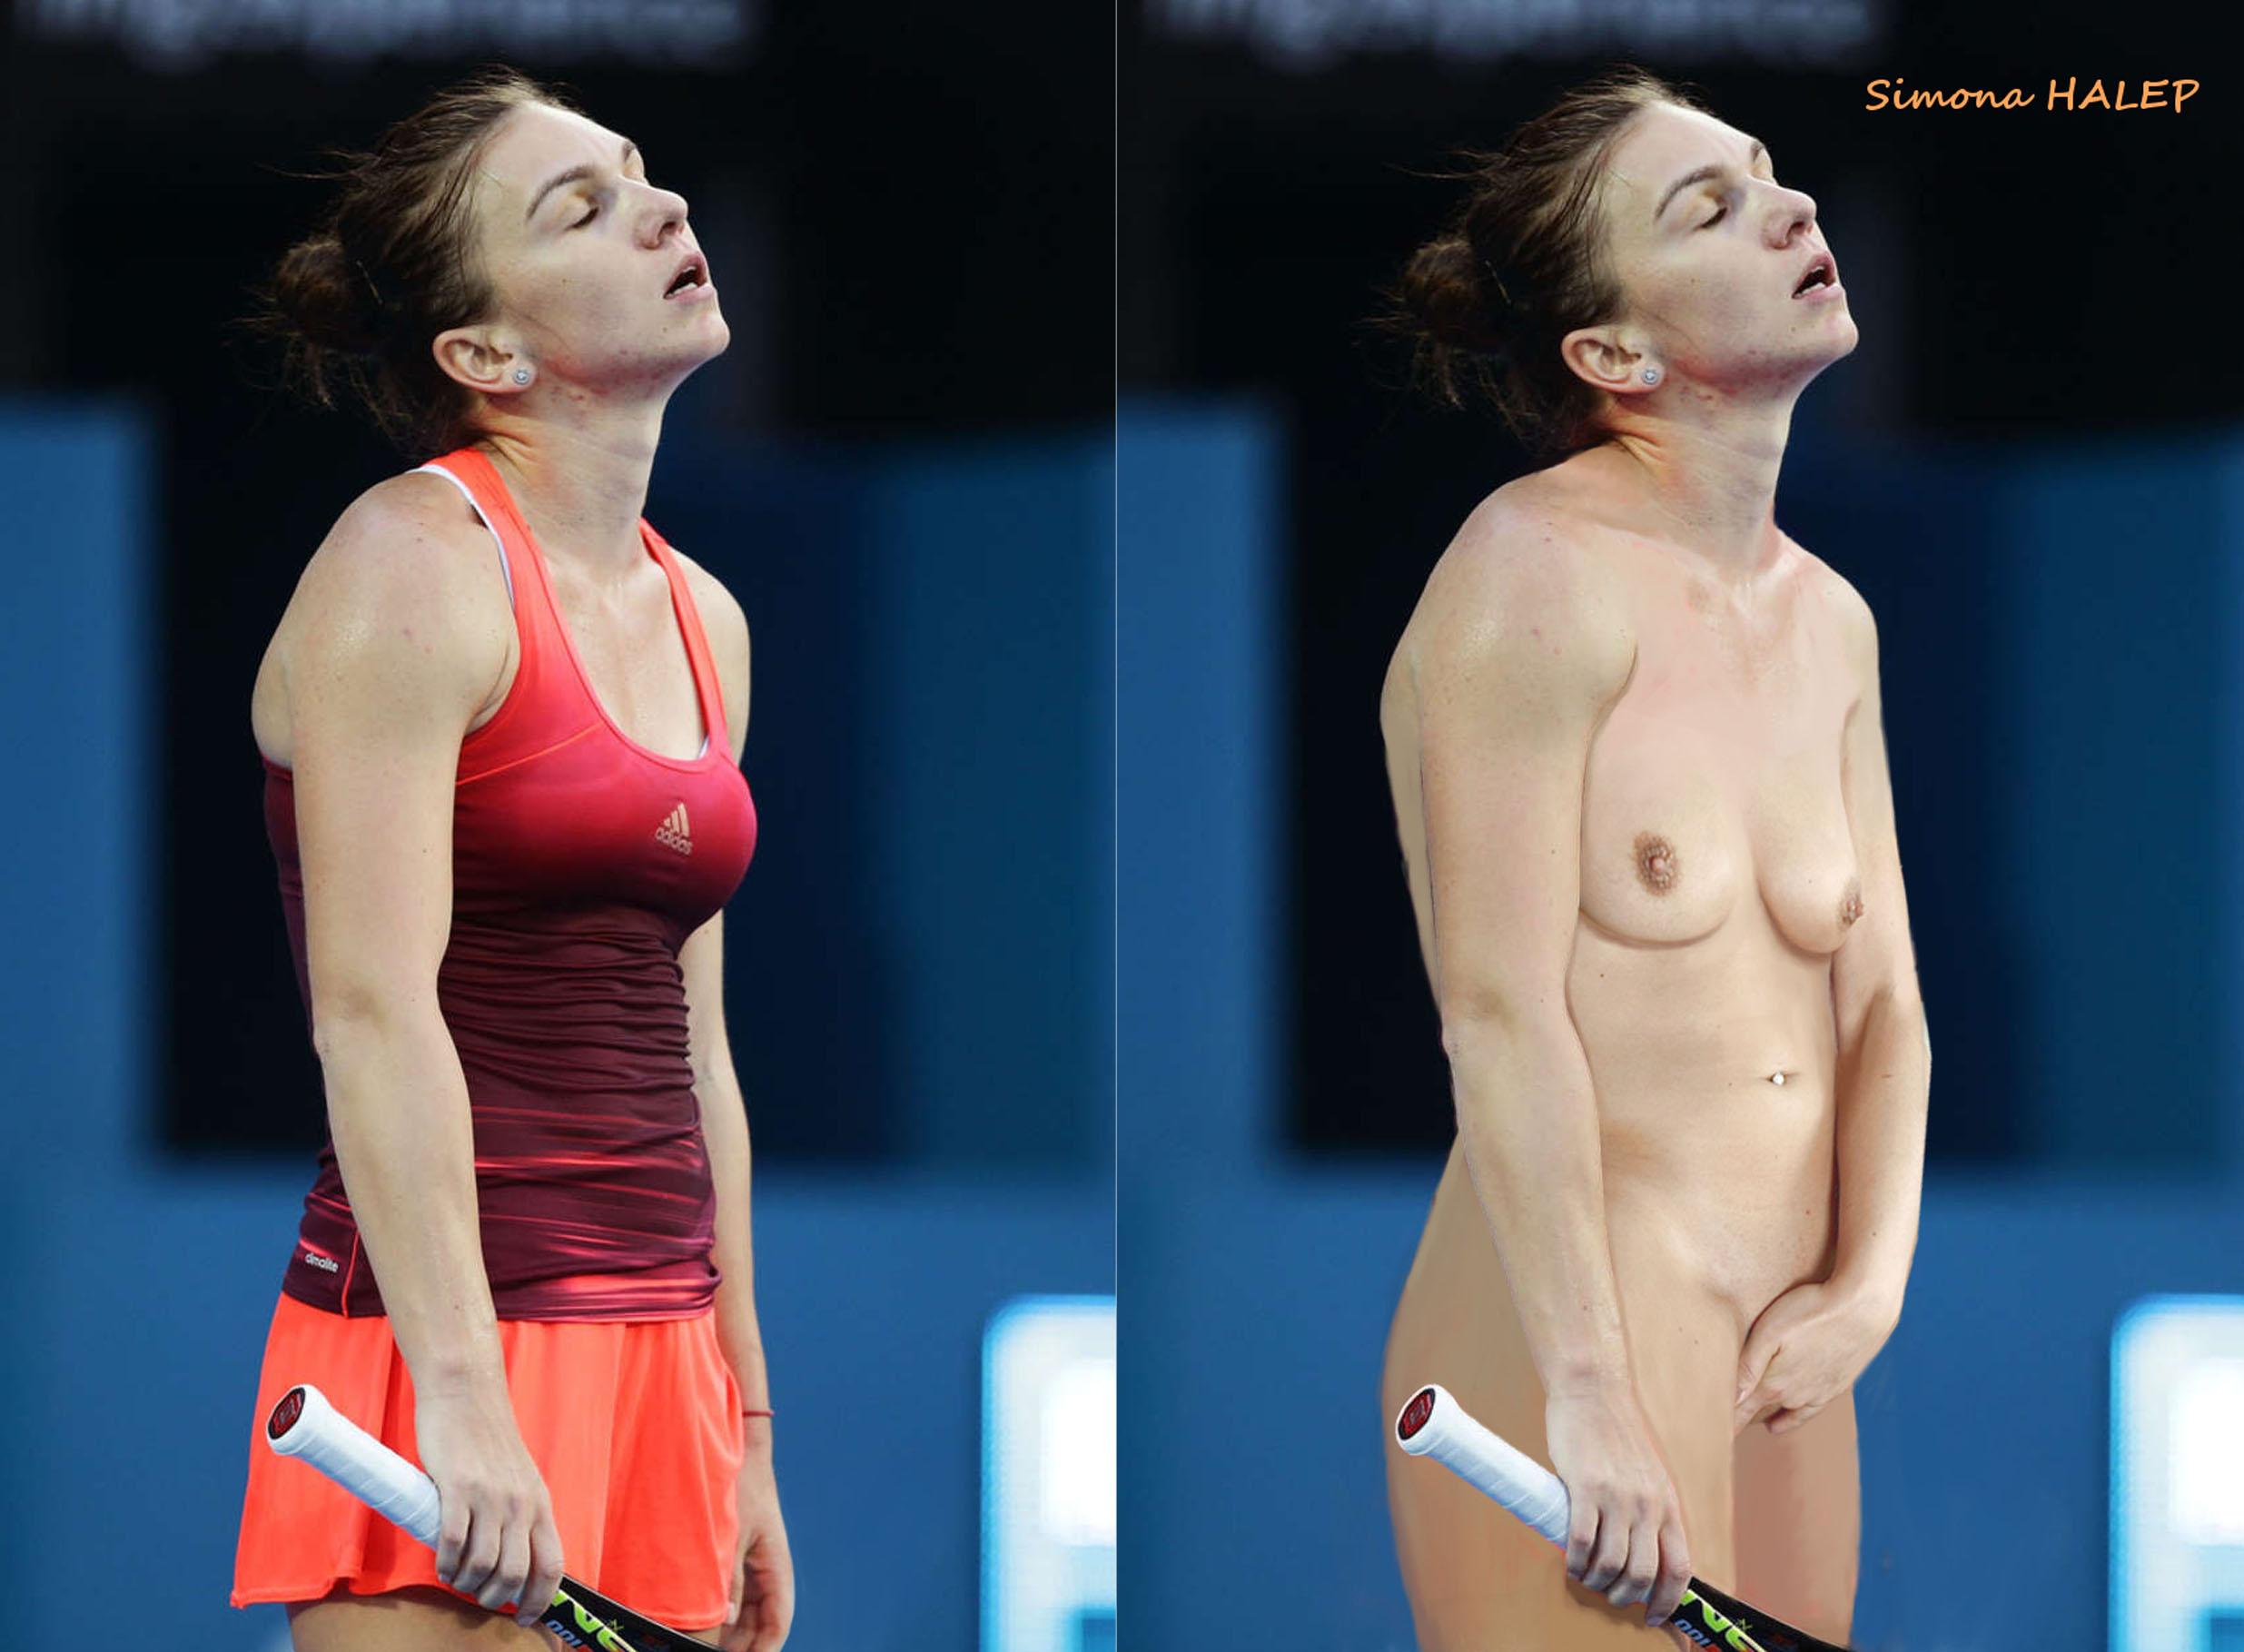 Simona halep nude